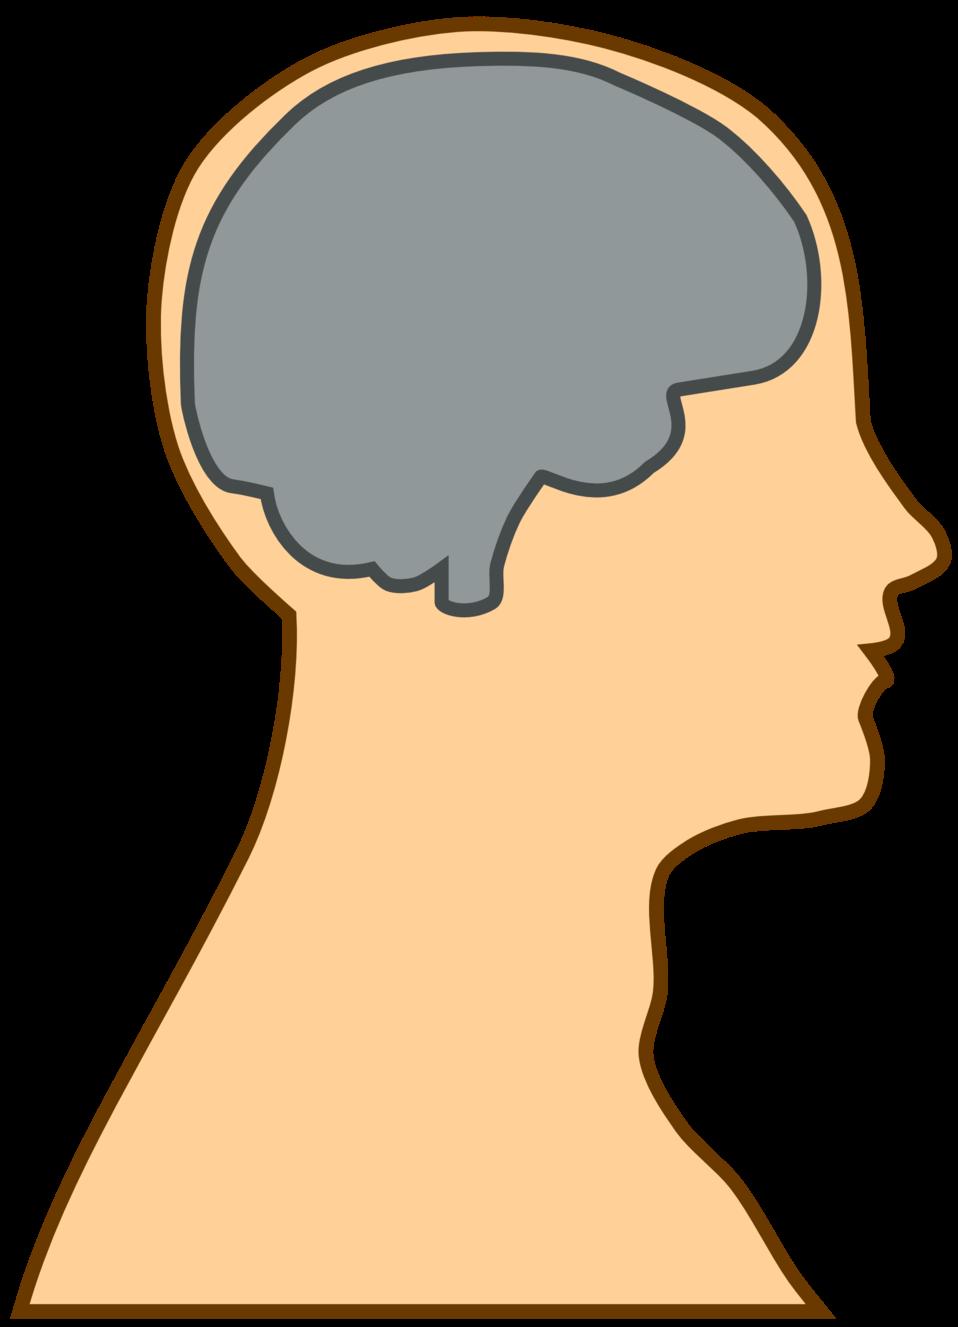 Public Domain Clip Art Image | Silhouette of a brain | ID ...